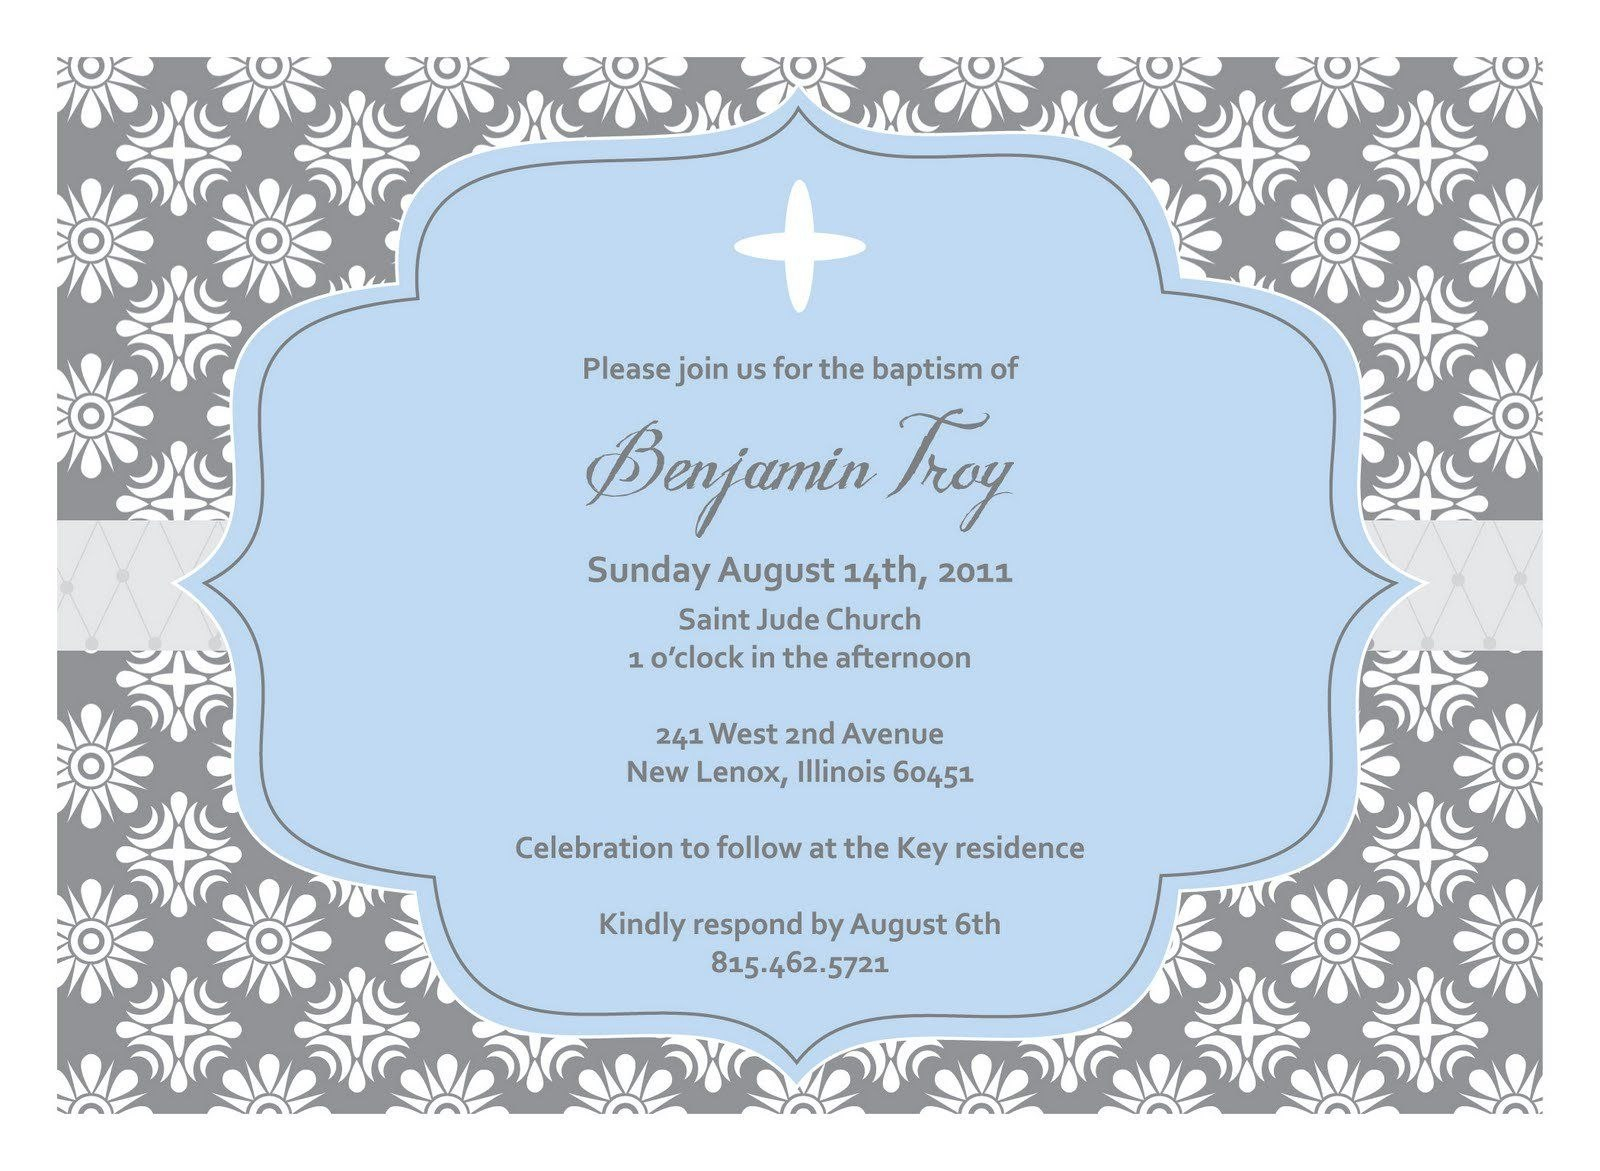 Christeninginvitationblanktemplate  Baptism Invitations With Regard To Blank Christening Invitation Templates